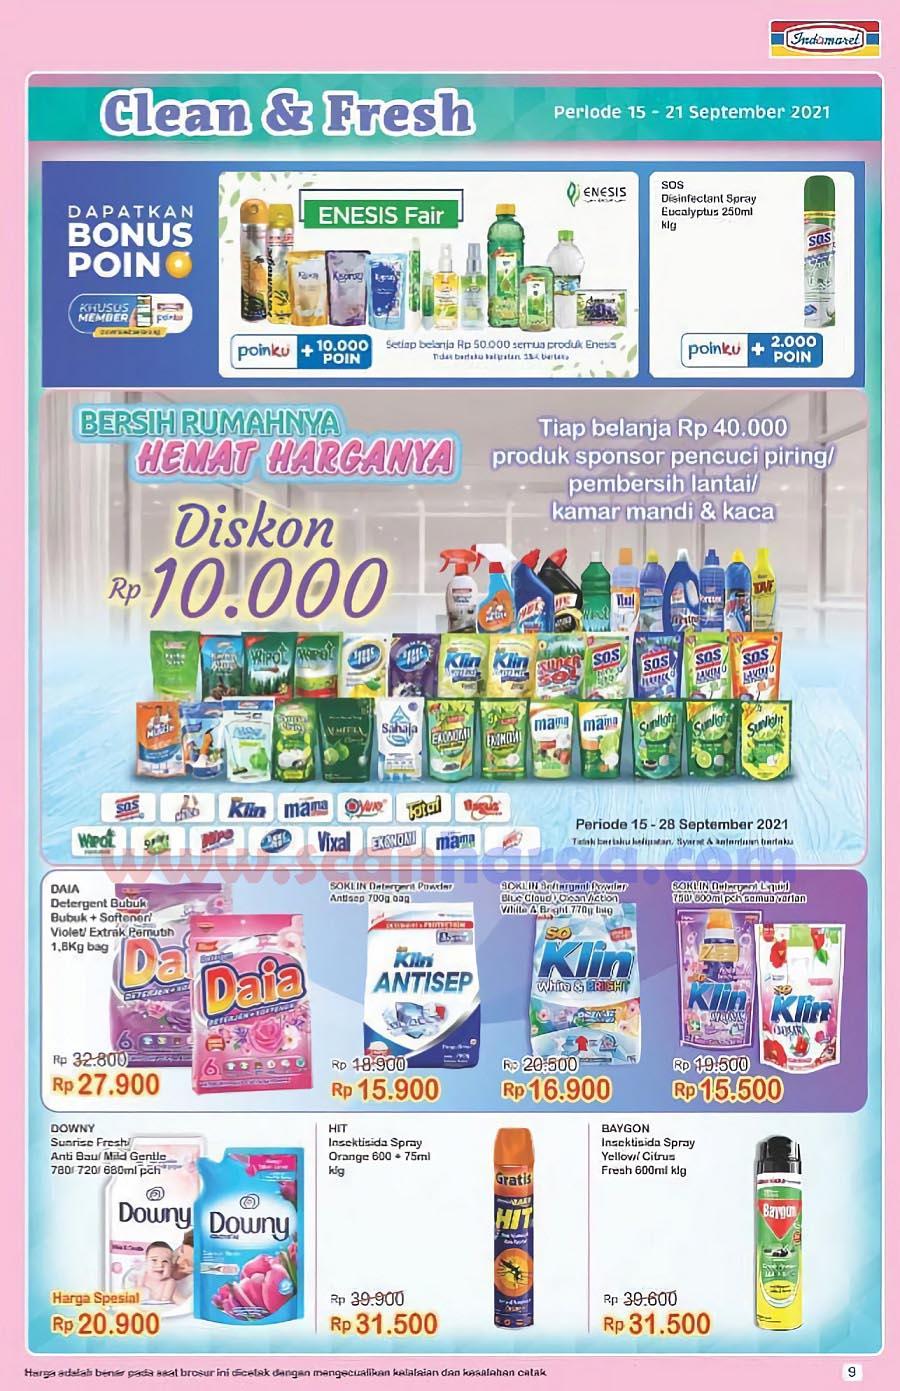 Katalog Indomaret Promo Terbaru 15 - 21 September 2021 9